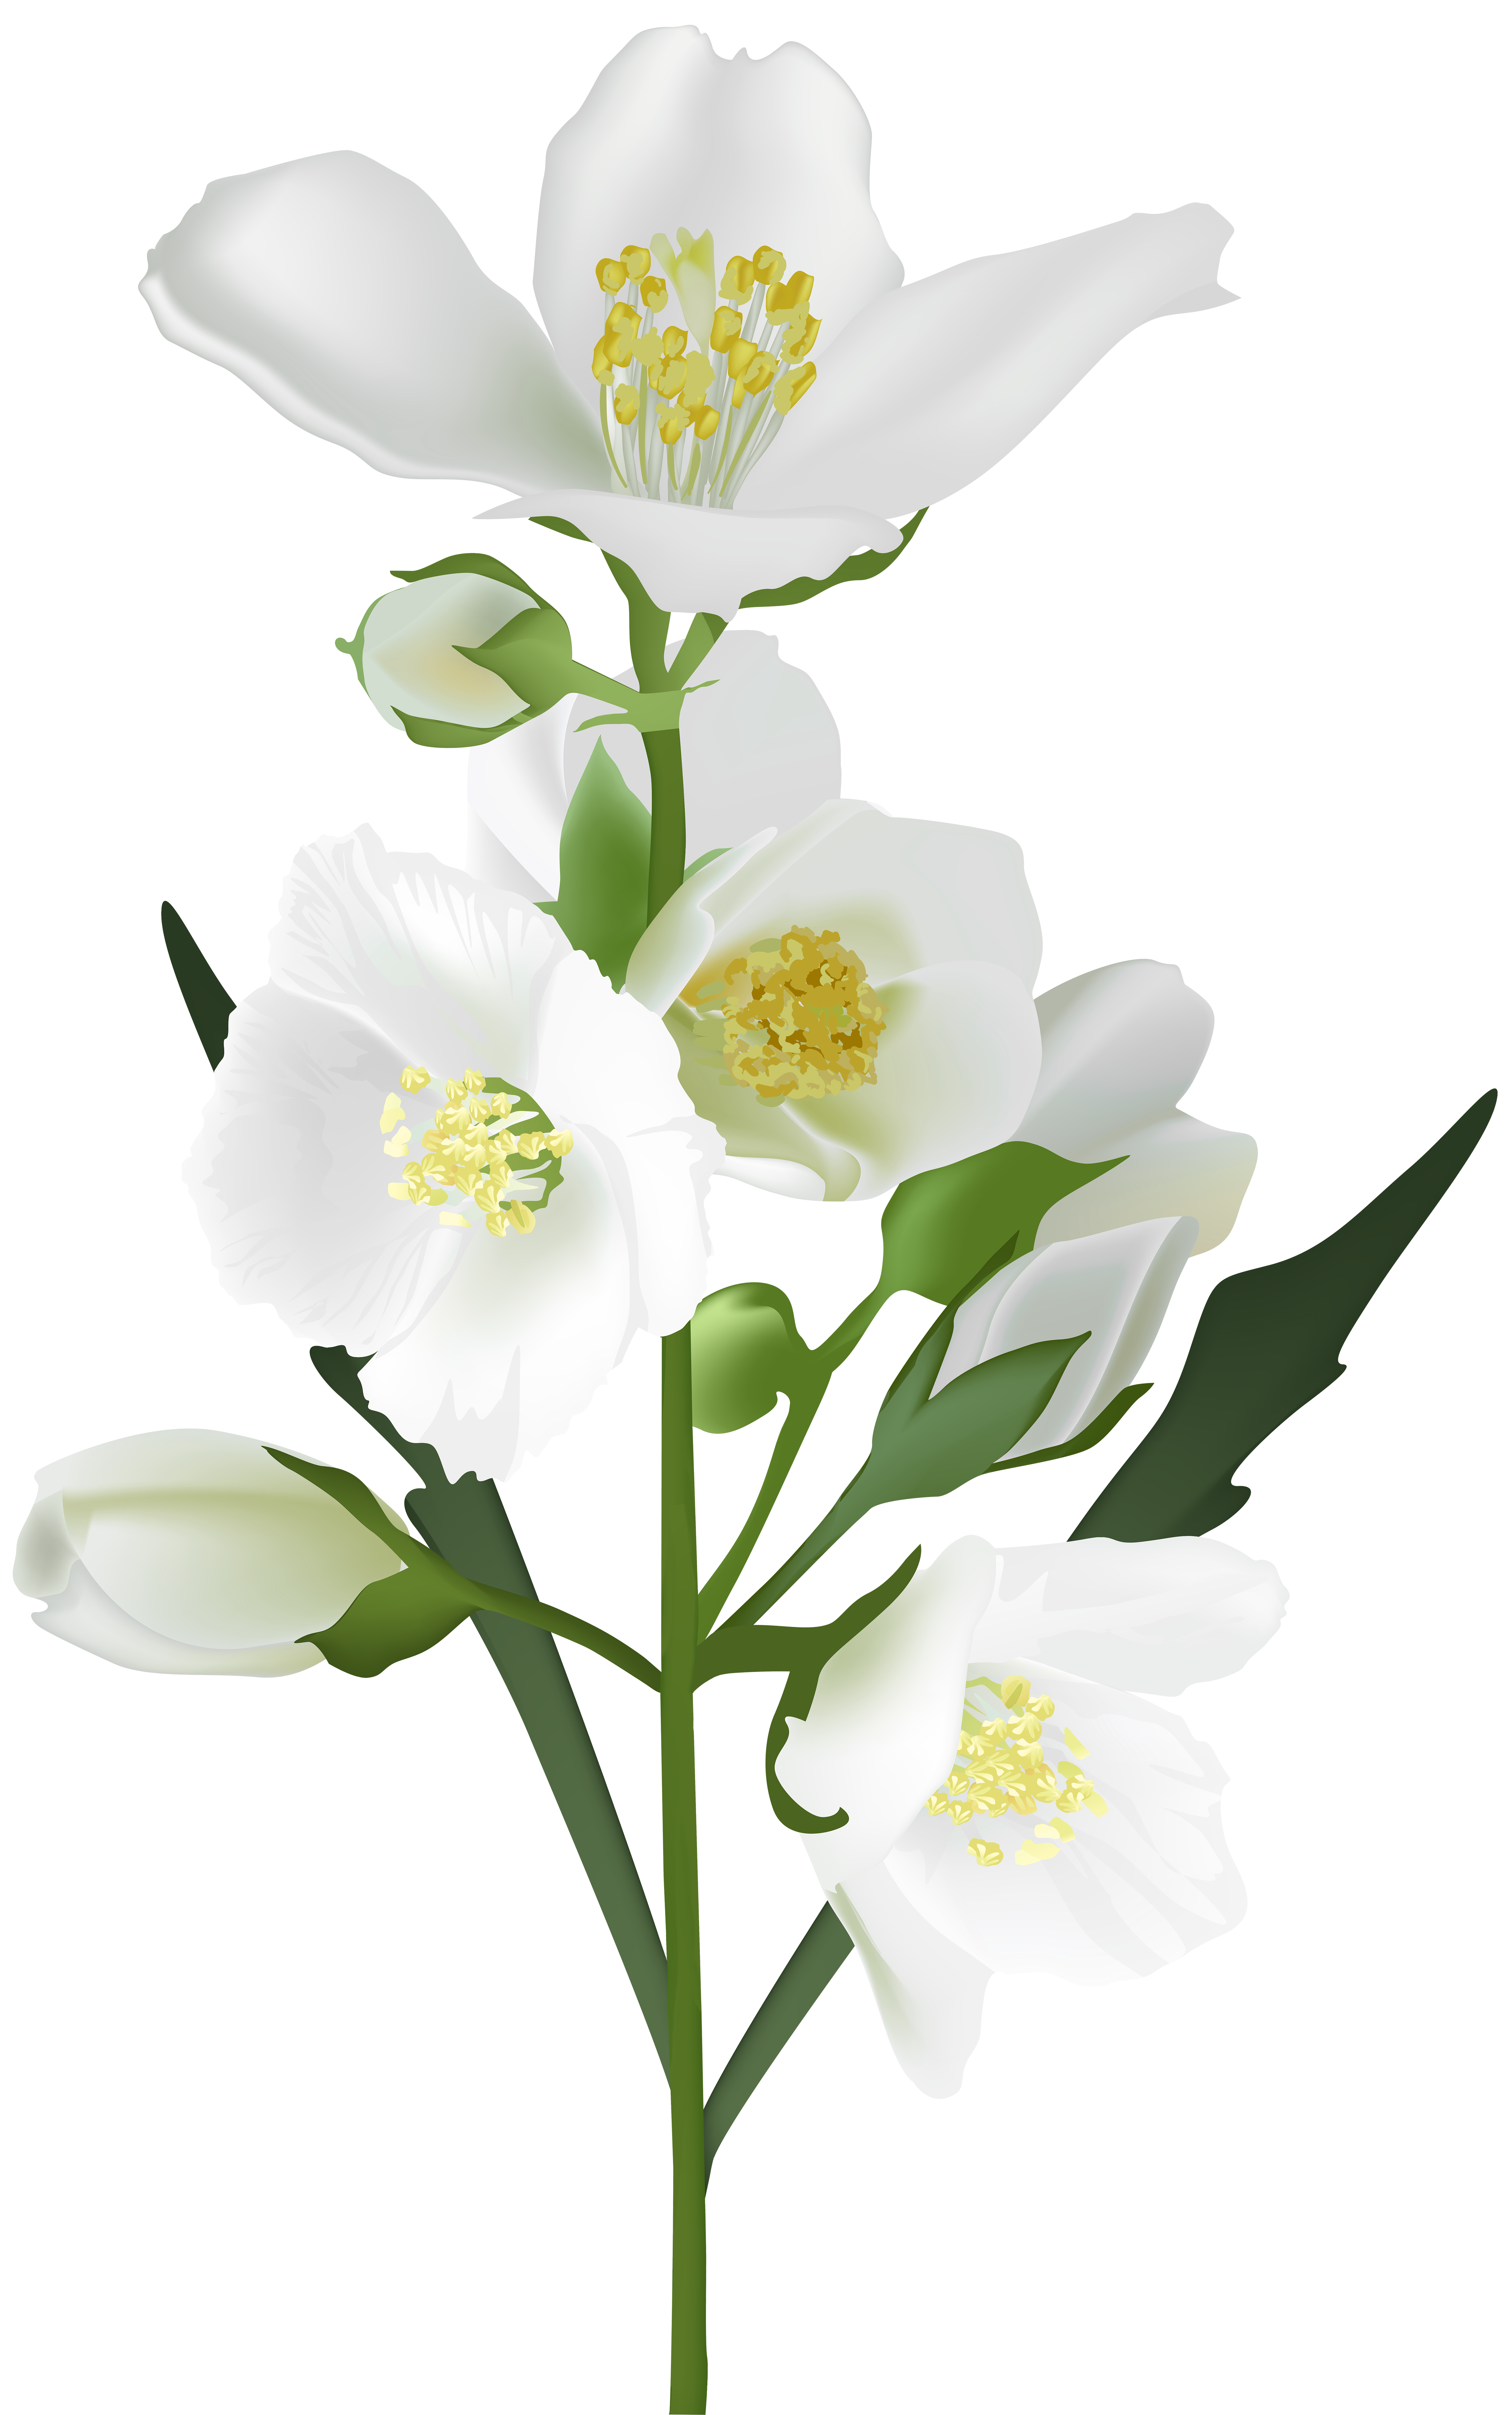 Jasmine flower clipart black and white graphic library stock Flower White Clip art - White Flower PNG Clip Art Image 5009*8000 ... graphic library stock